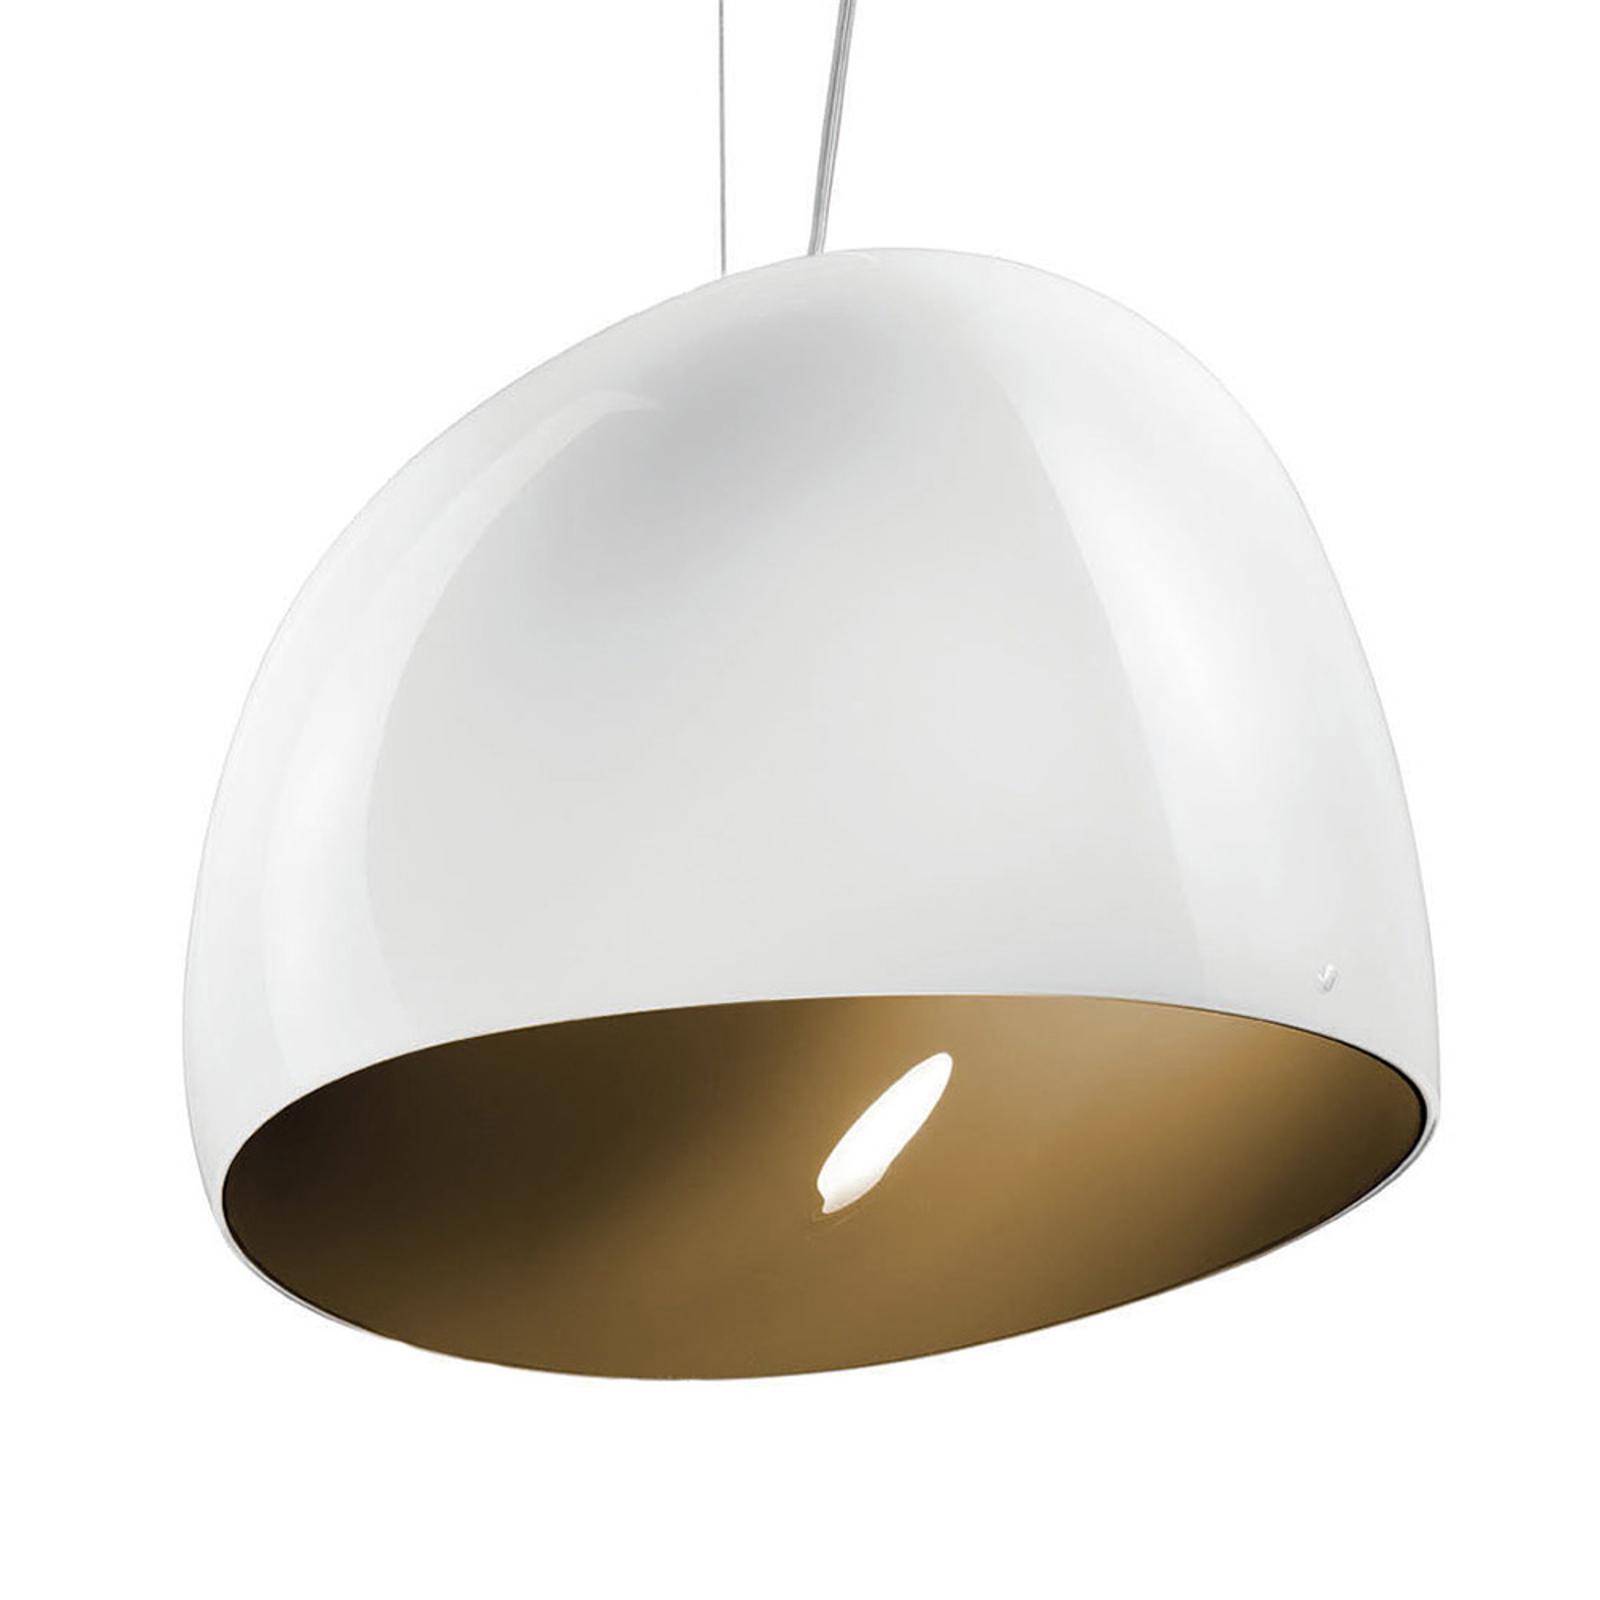 Hanglamp Surface Ø 40 cm, E27 wit/aardbruin